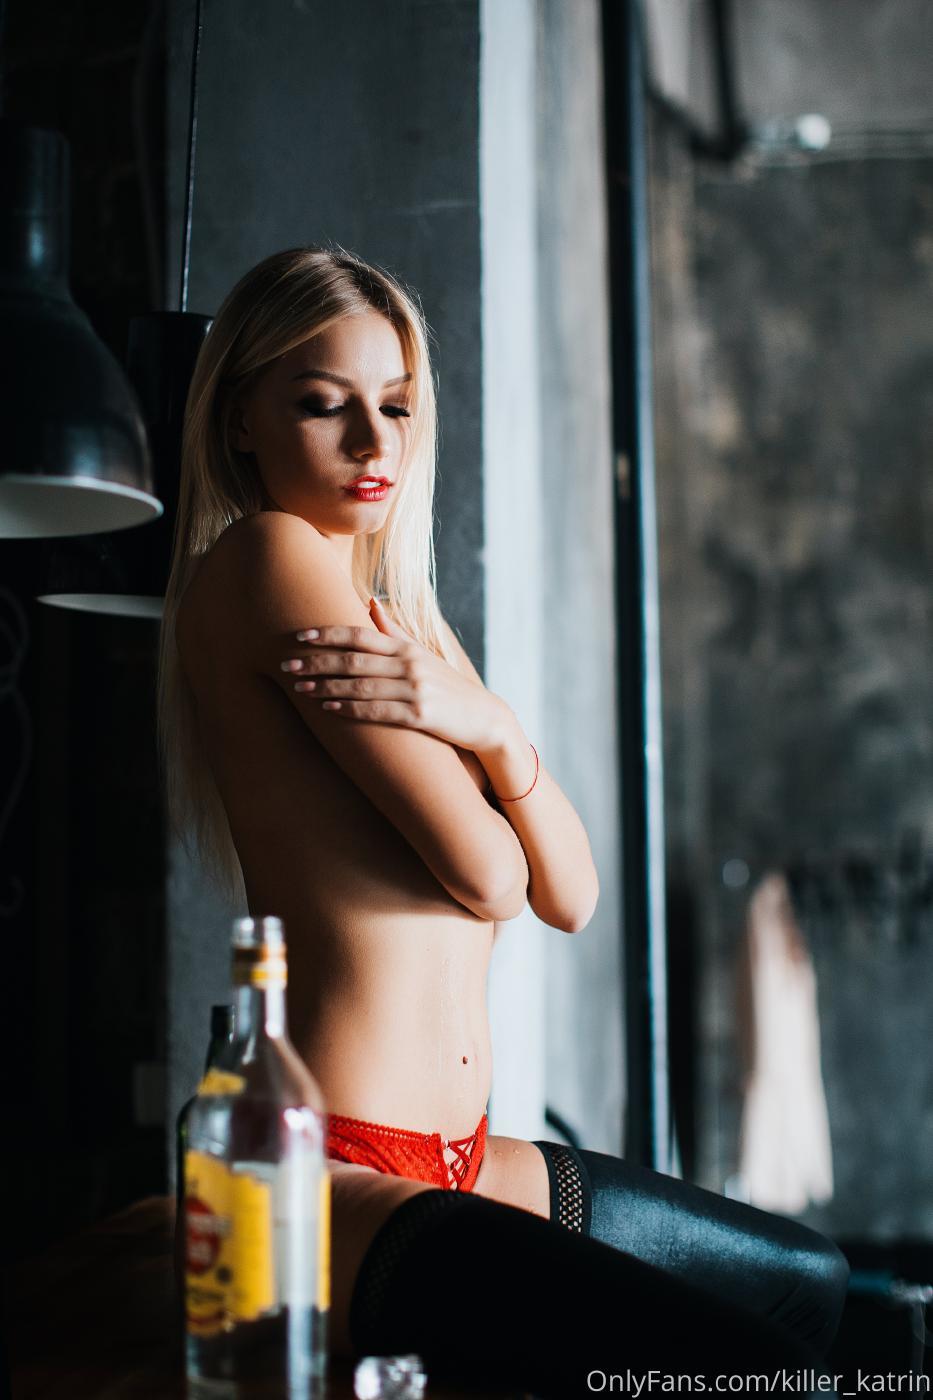 Killer Katrin Topless Bar Strip Onlyfans Set Leaked Matnze